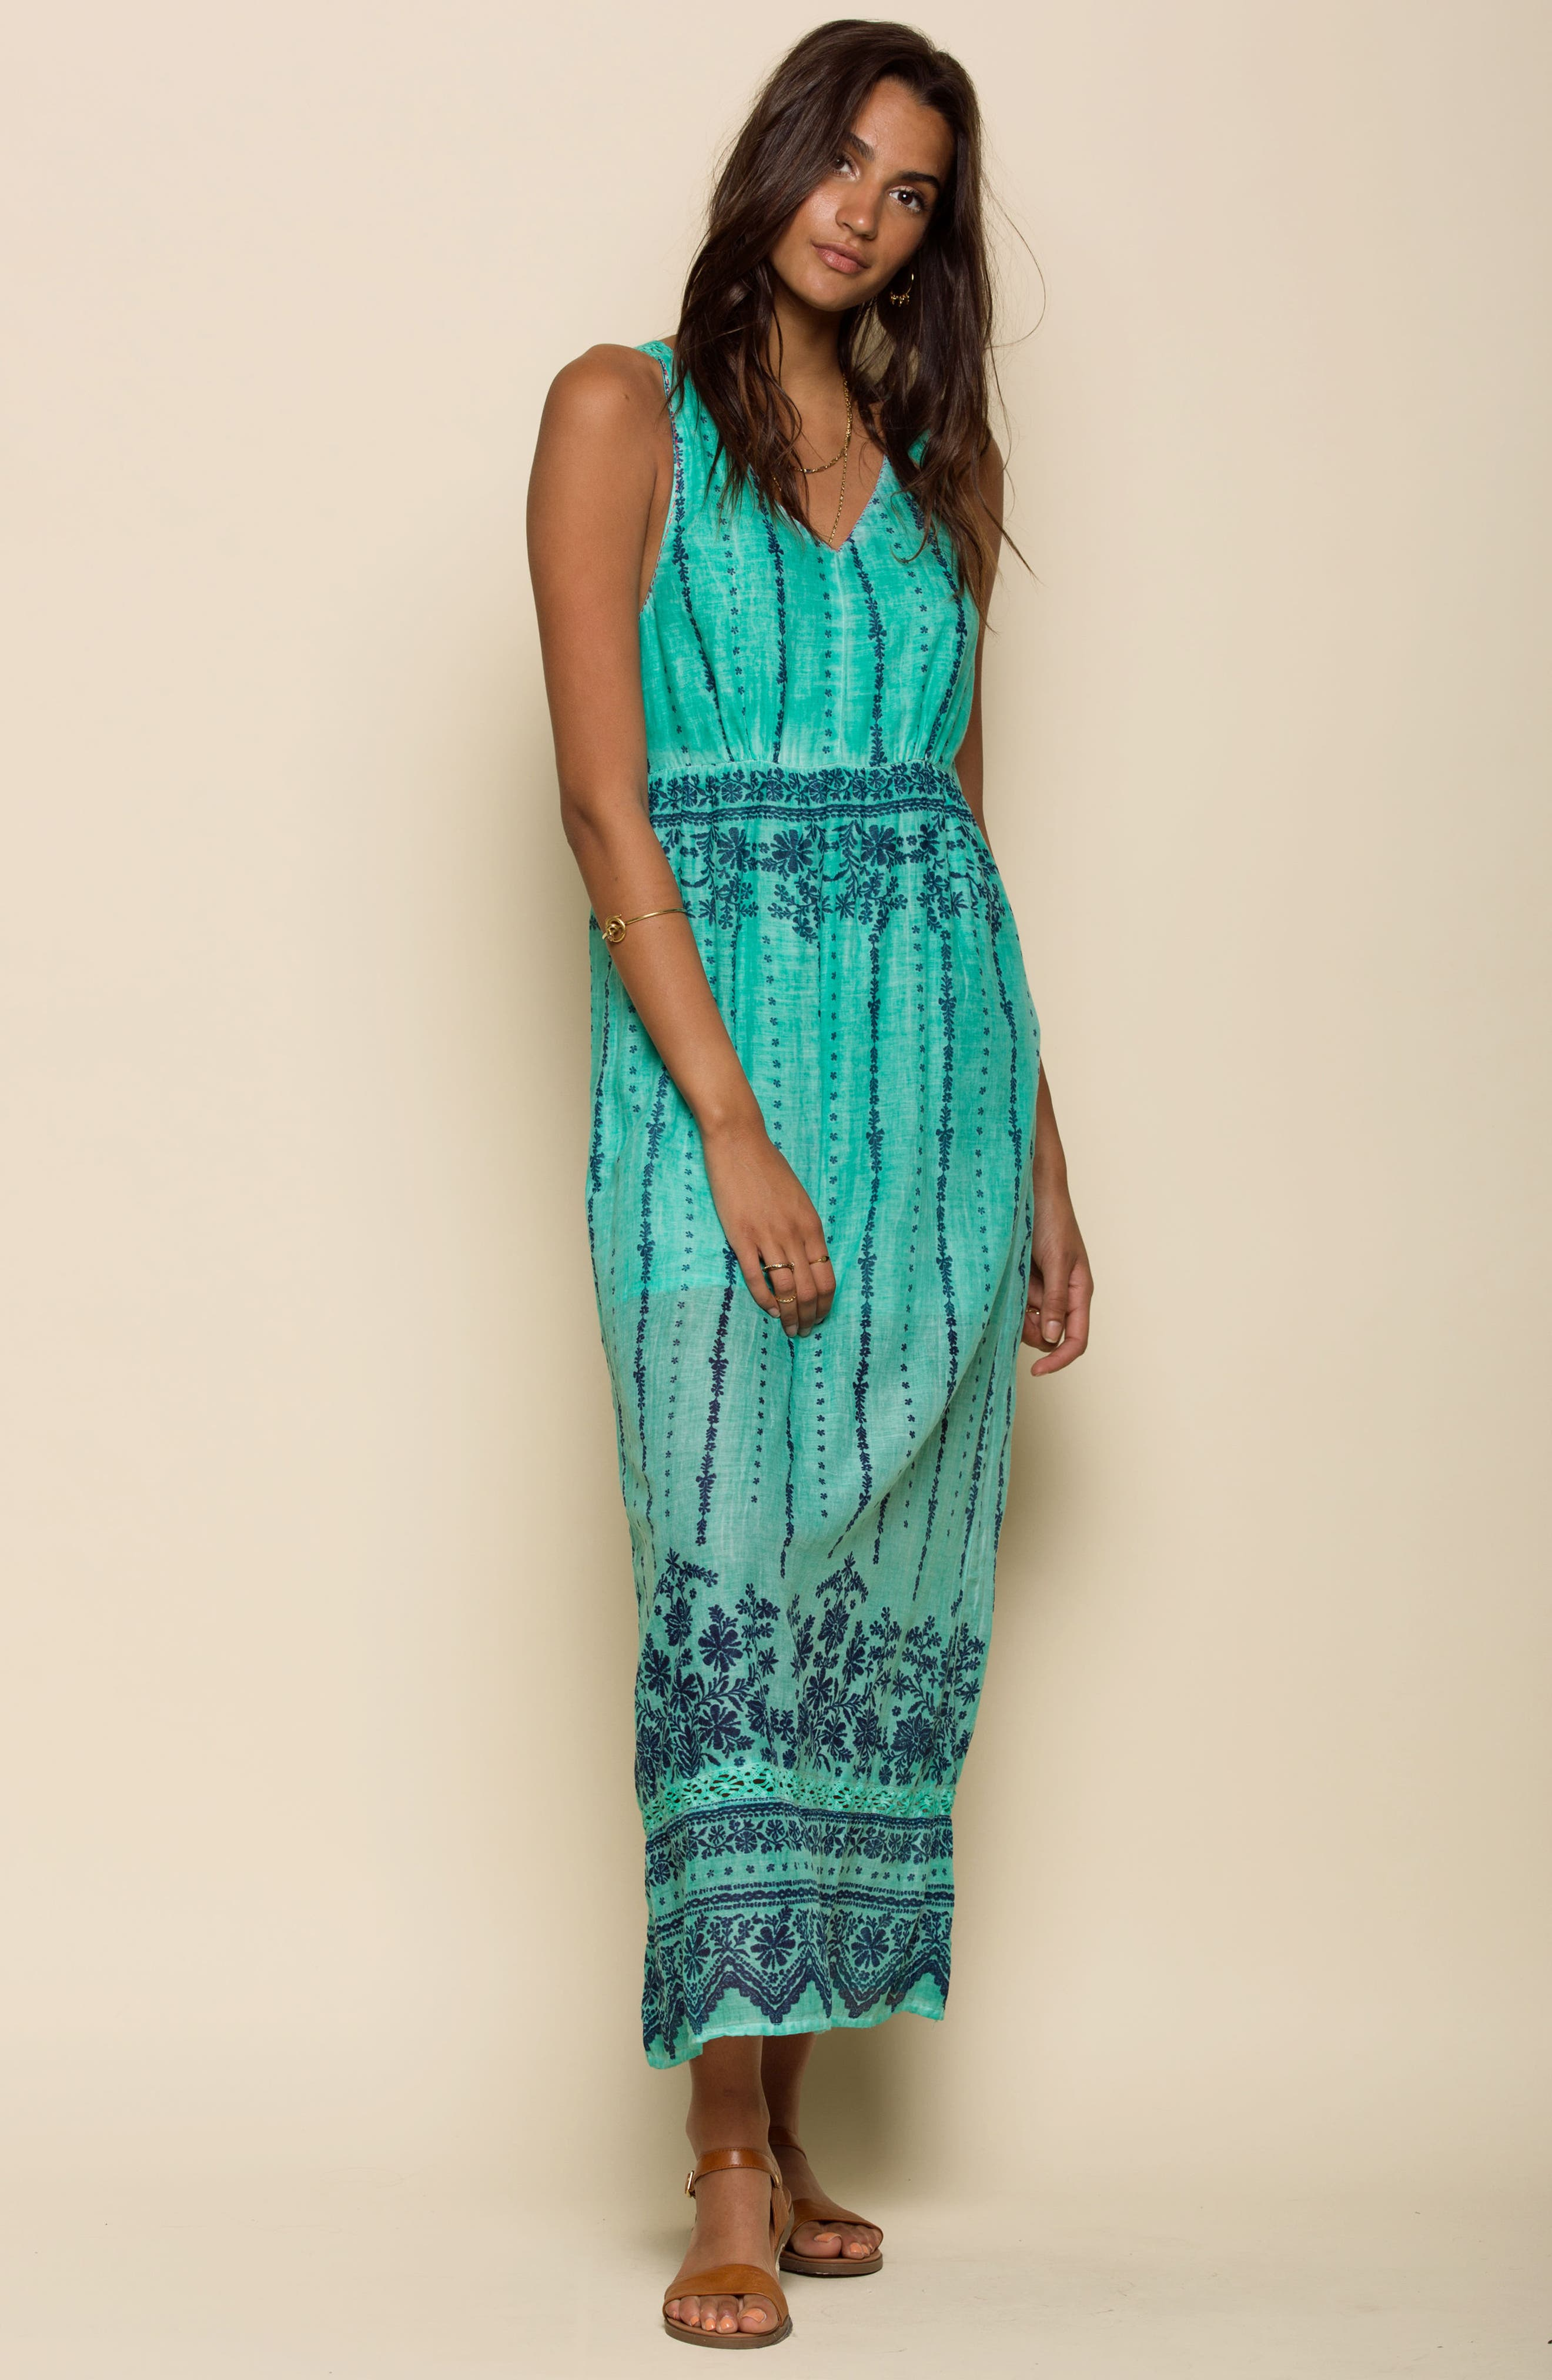 La Playita Maxi Dress,                             Alternate thumbnail 8, color,                             300